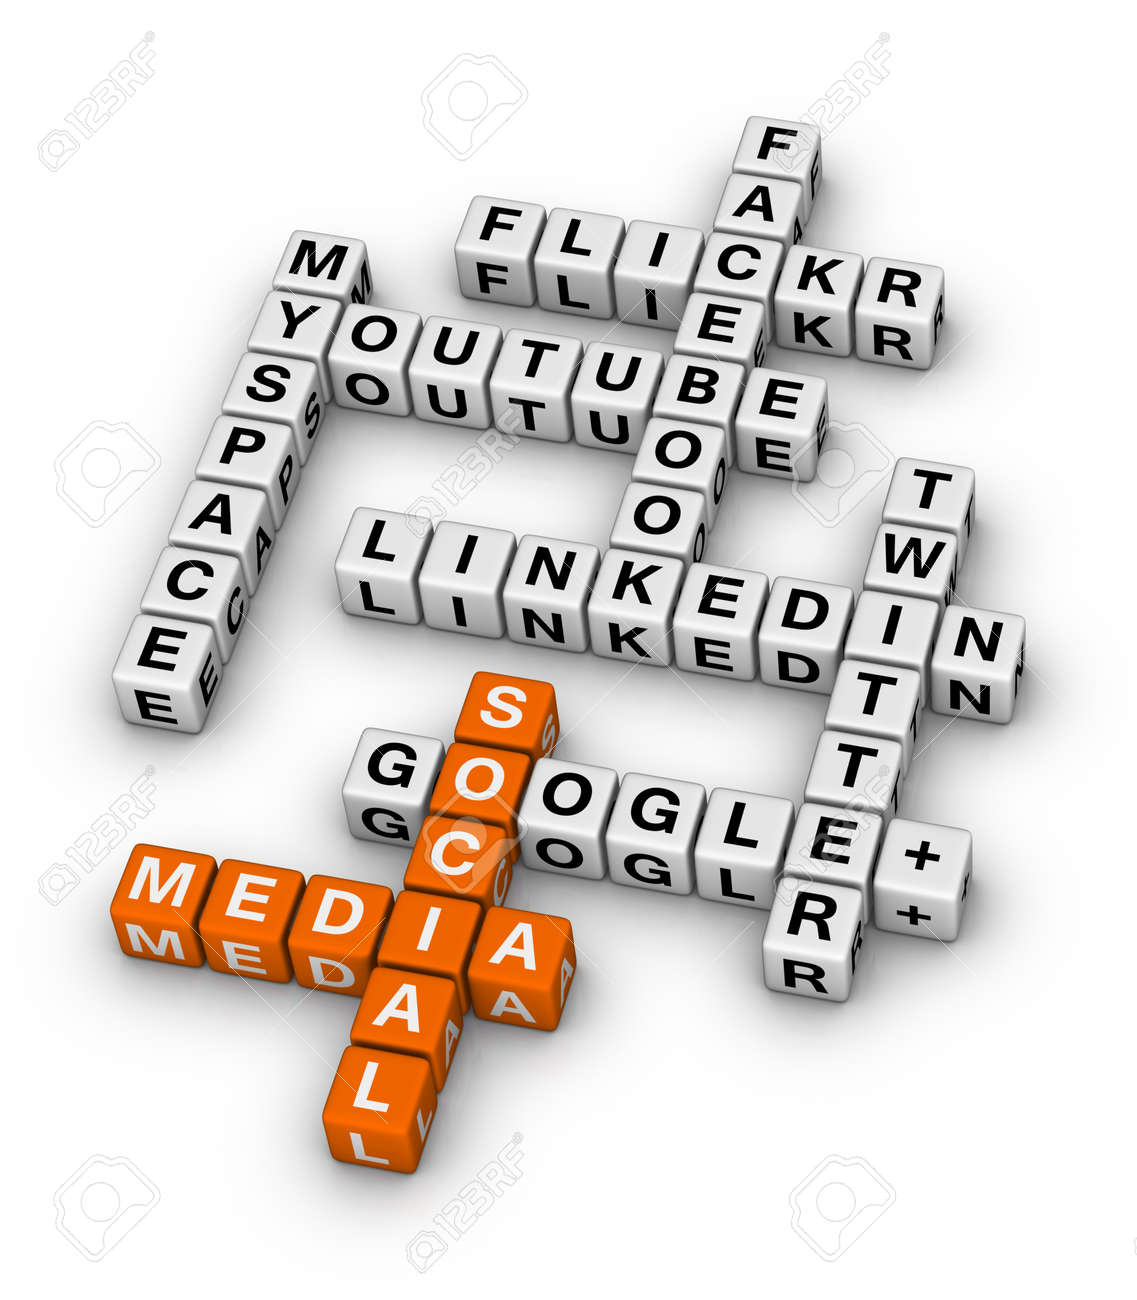 Most Popular Social Networking Sites crossword - 12374341